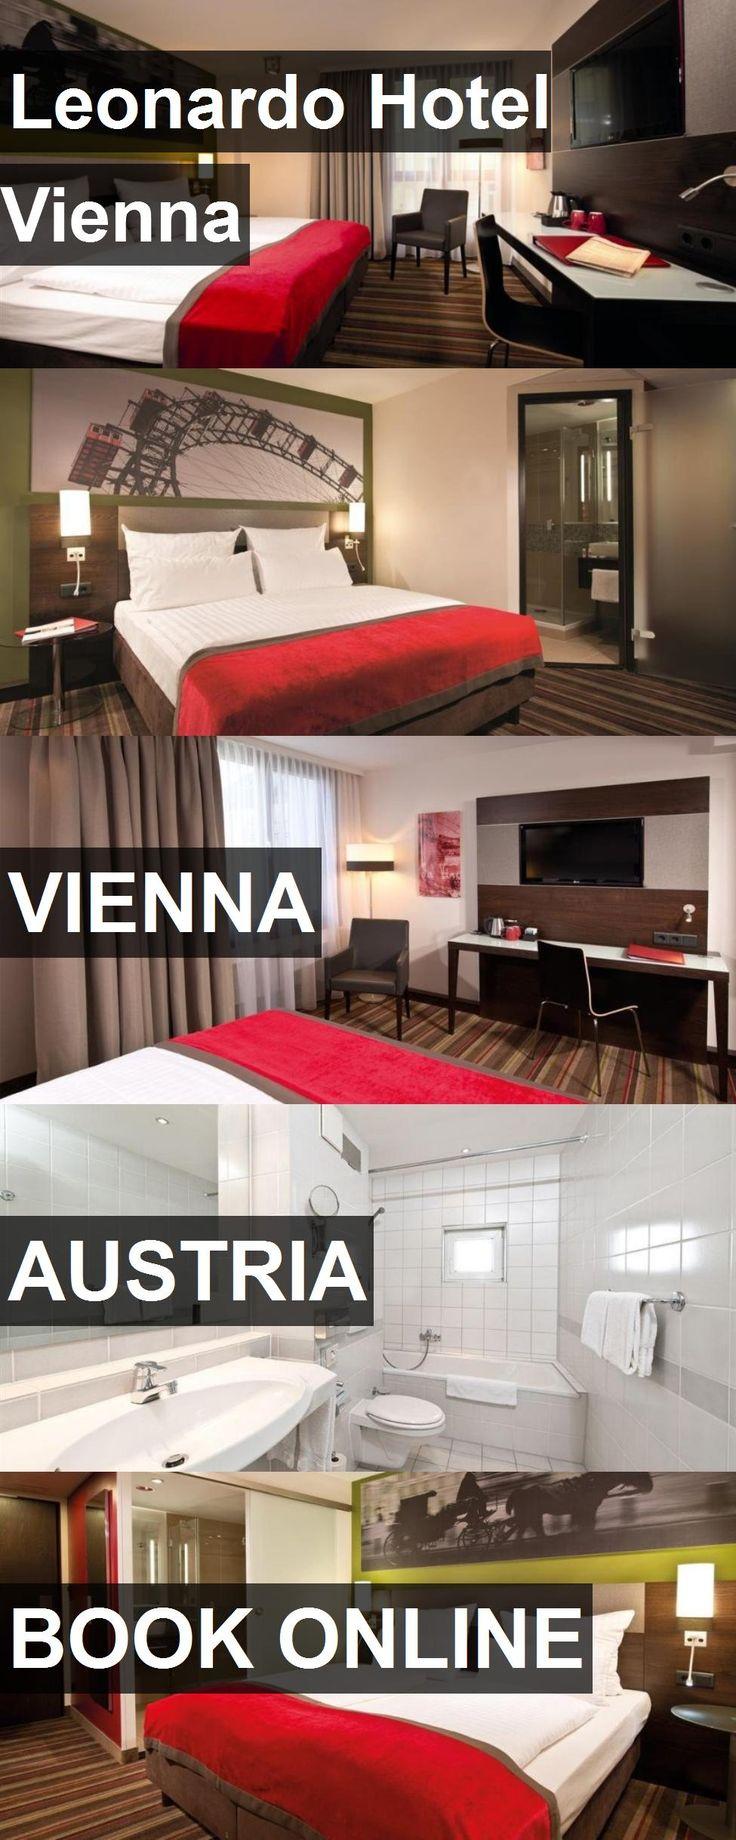 Hotel Leonardo Hotel Vienna in Vienna, Austria. For more information, photos, reviews and best prices please follow the link. #Austria #Vienna #LeonardoHotelVienna #hotel #travel #vacation